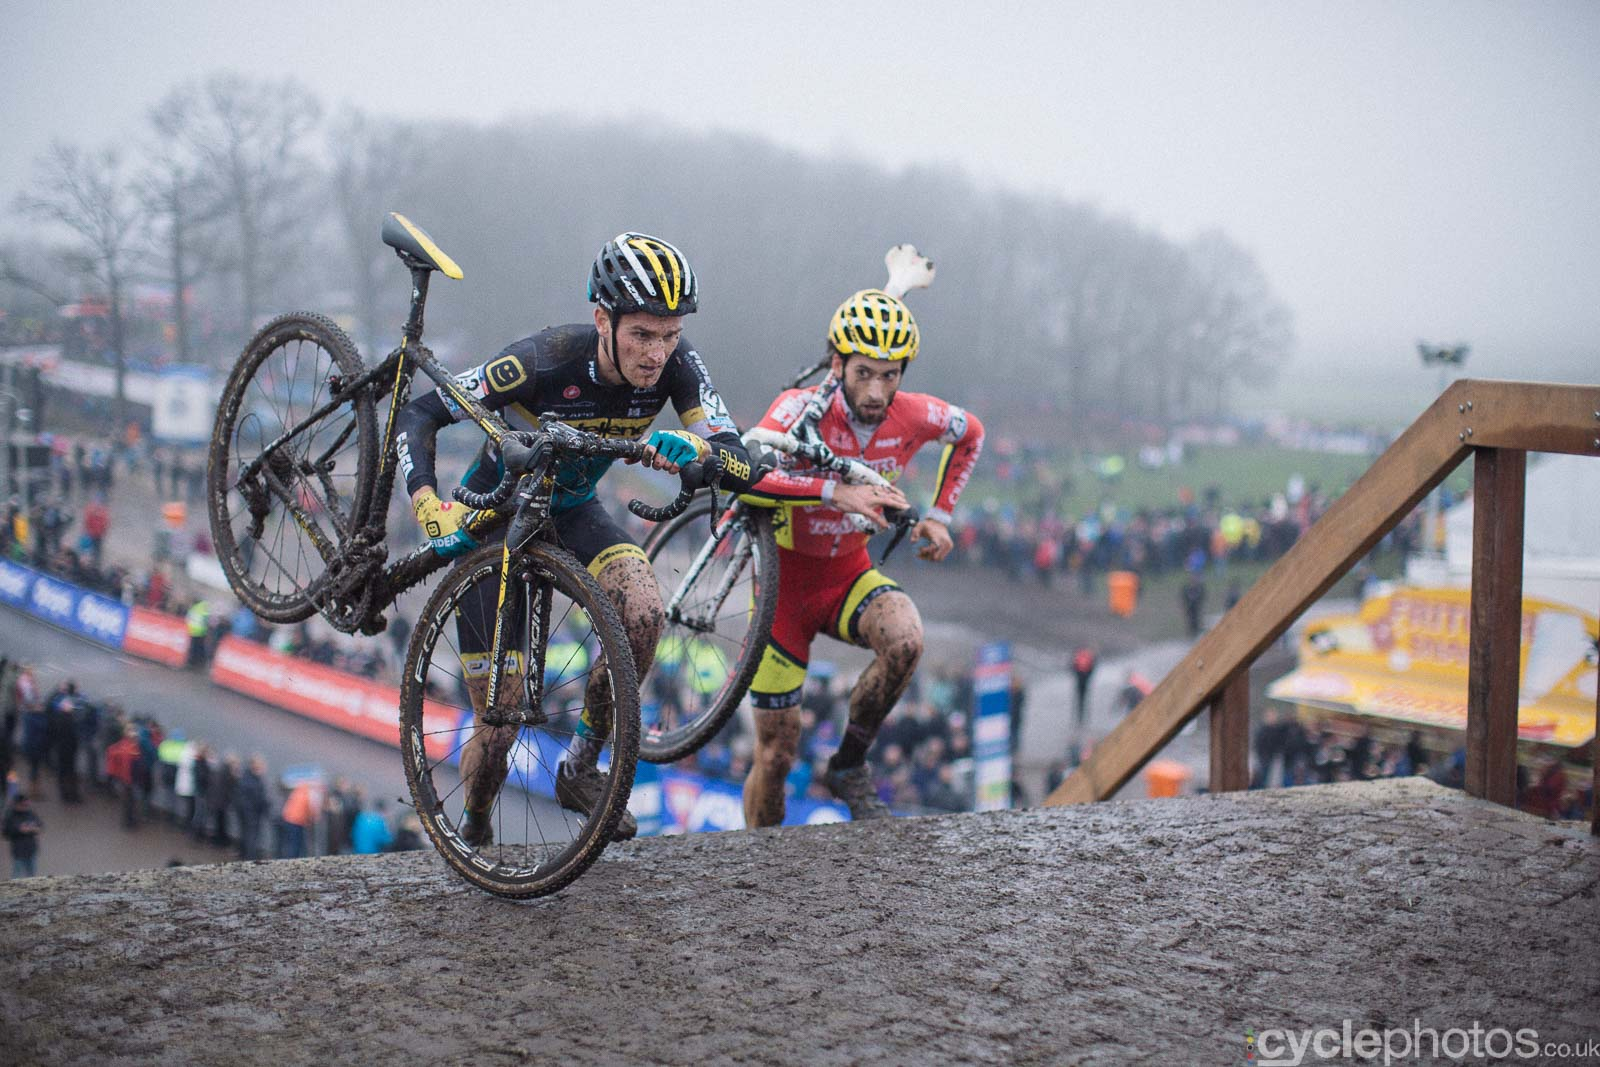 2016-cyclephotos-cyclocross-hoogerheide-151643-jim-aernouts